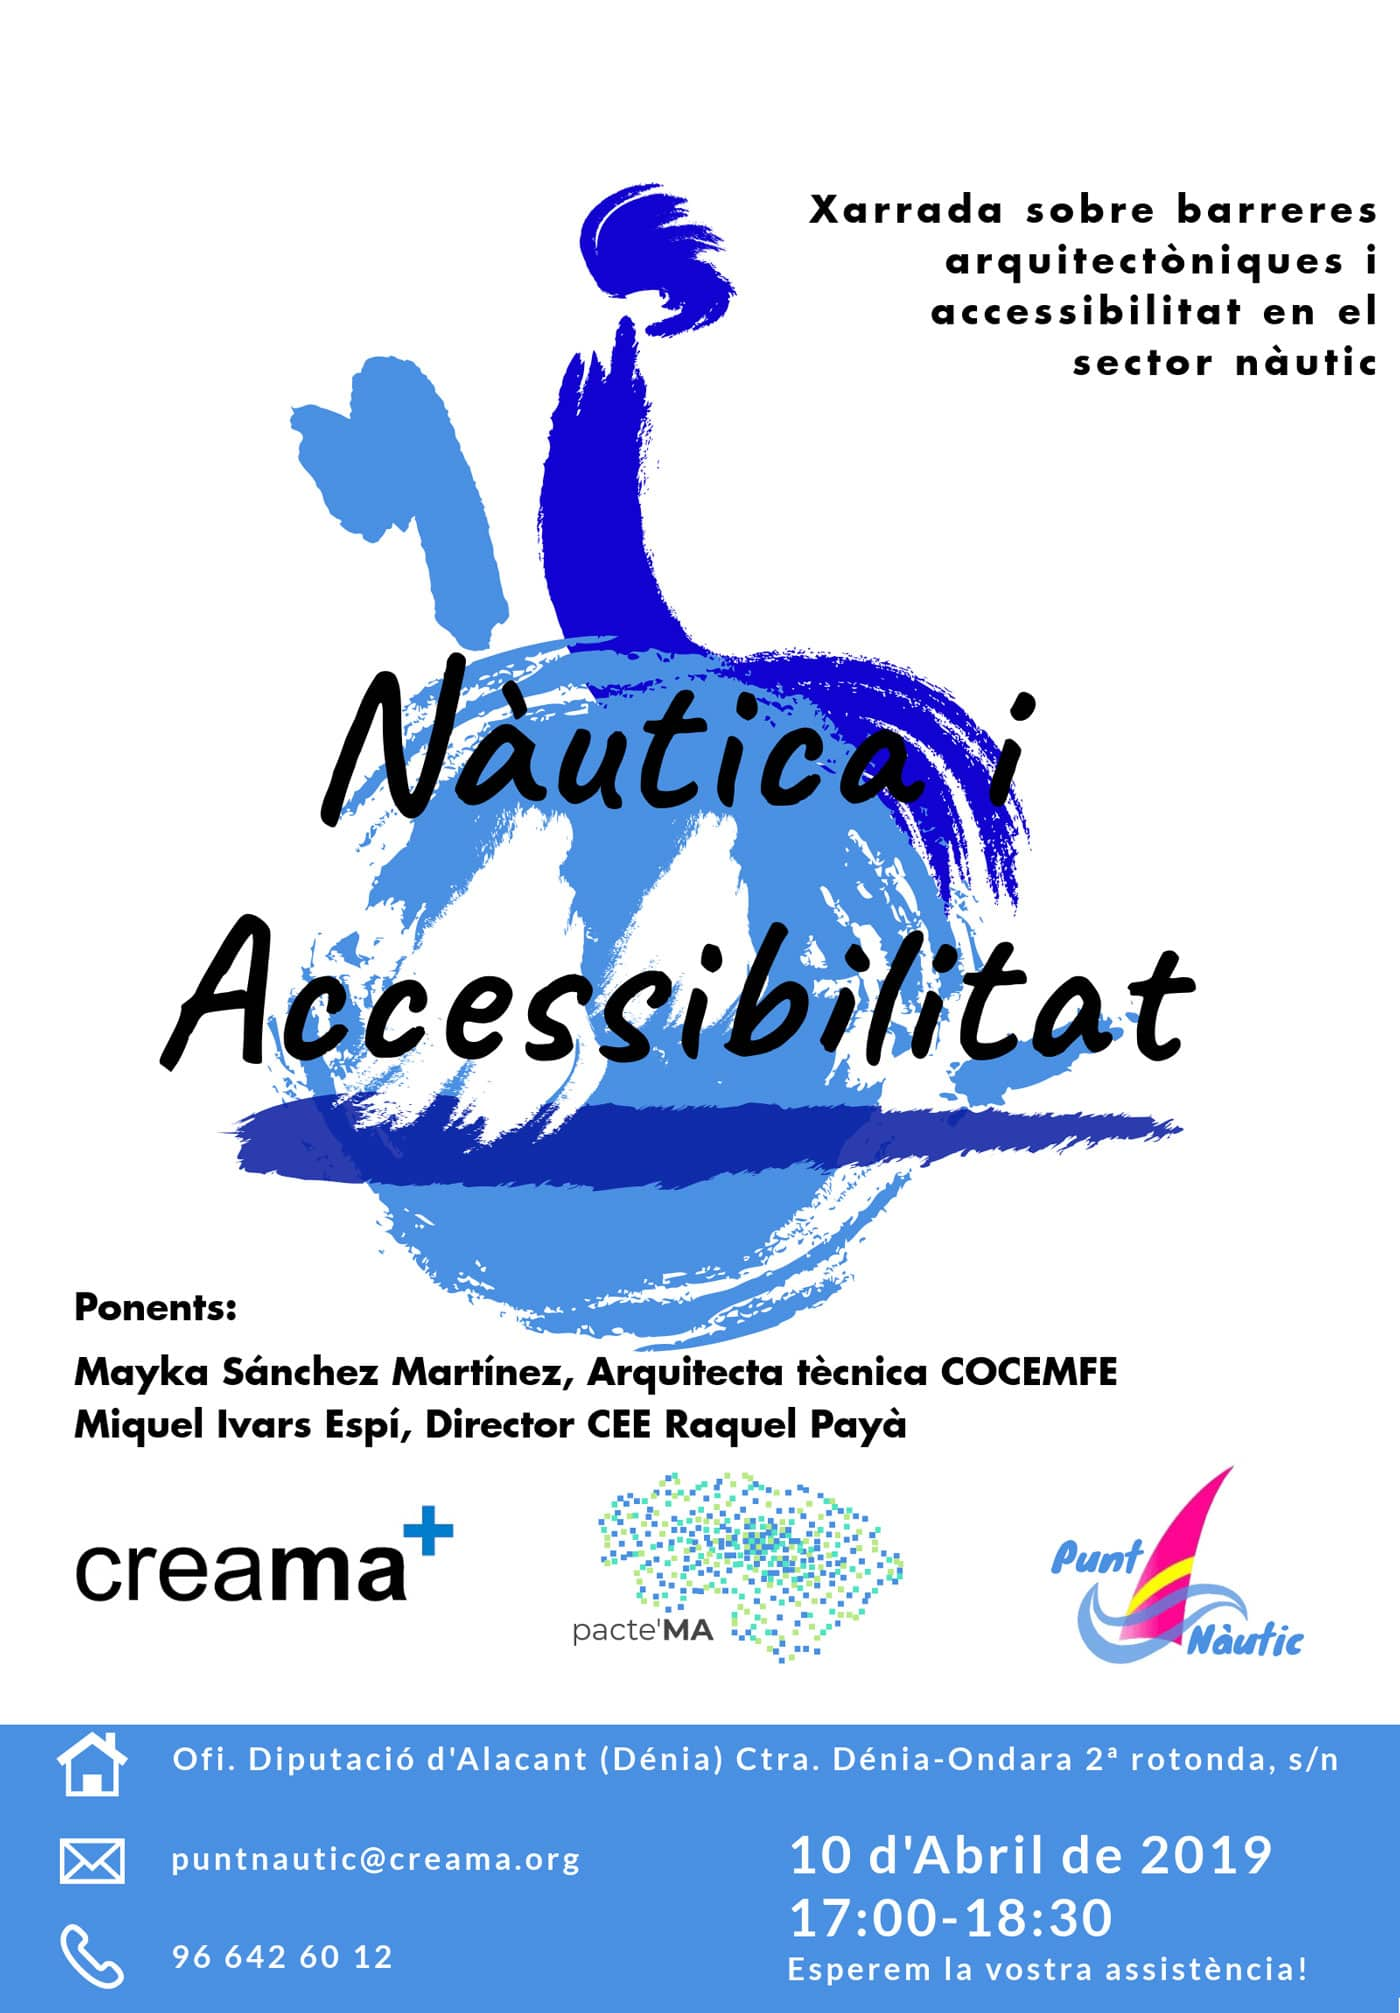 CREAMA_NauticayAccesibilidad